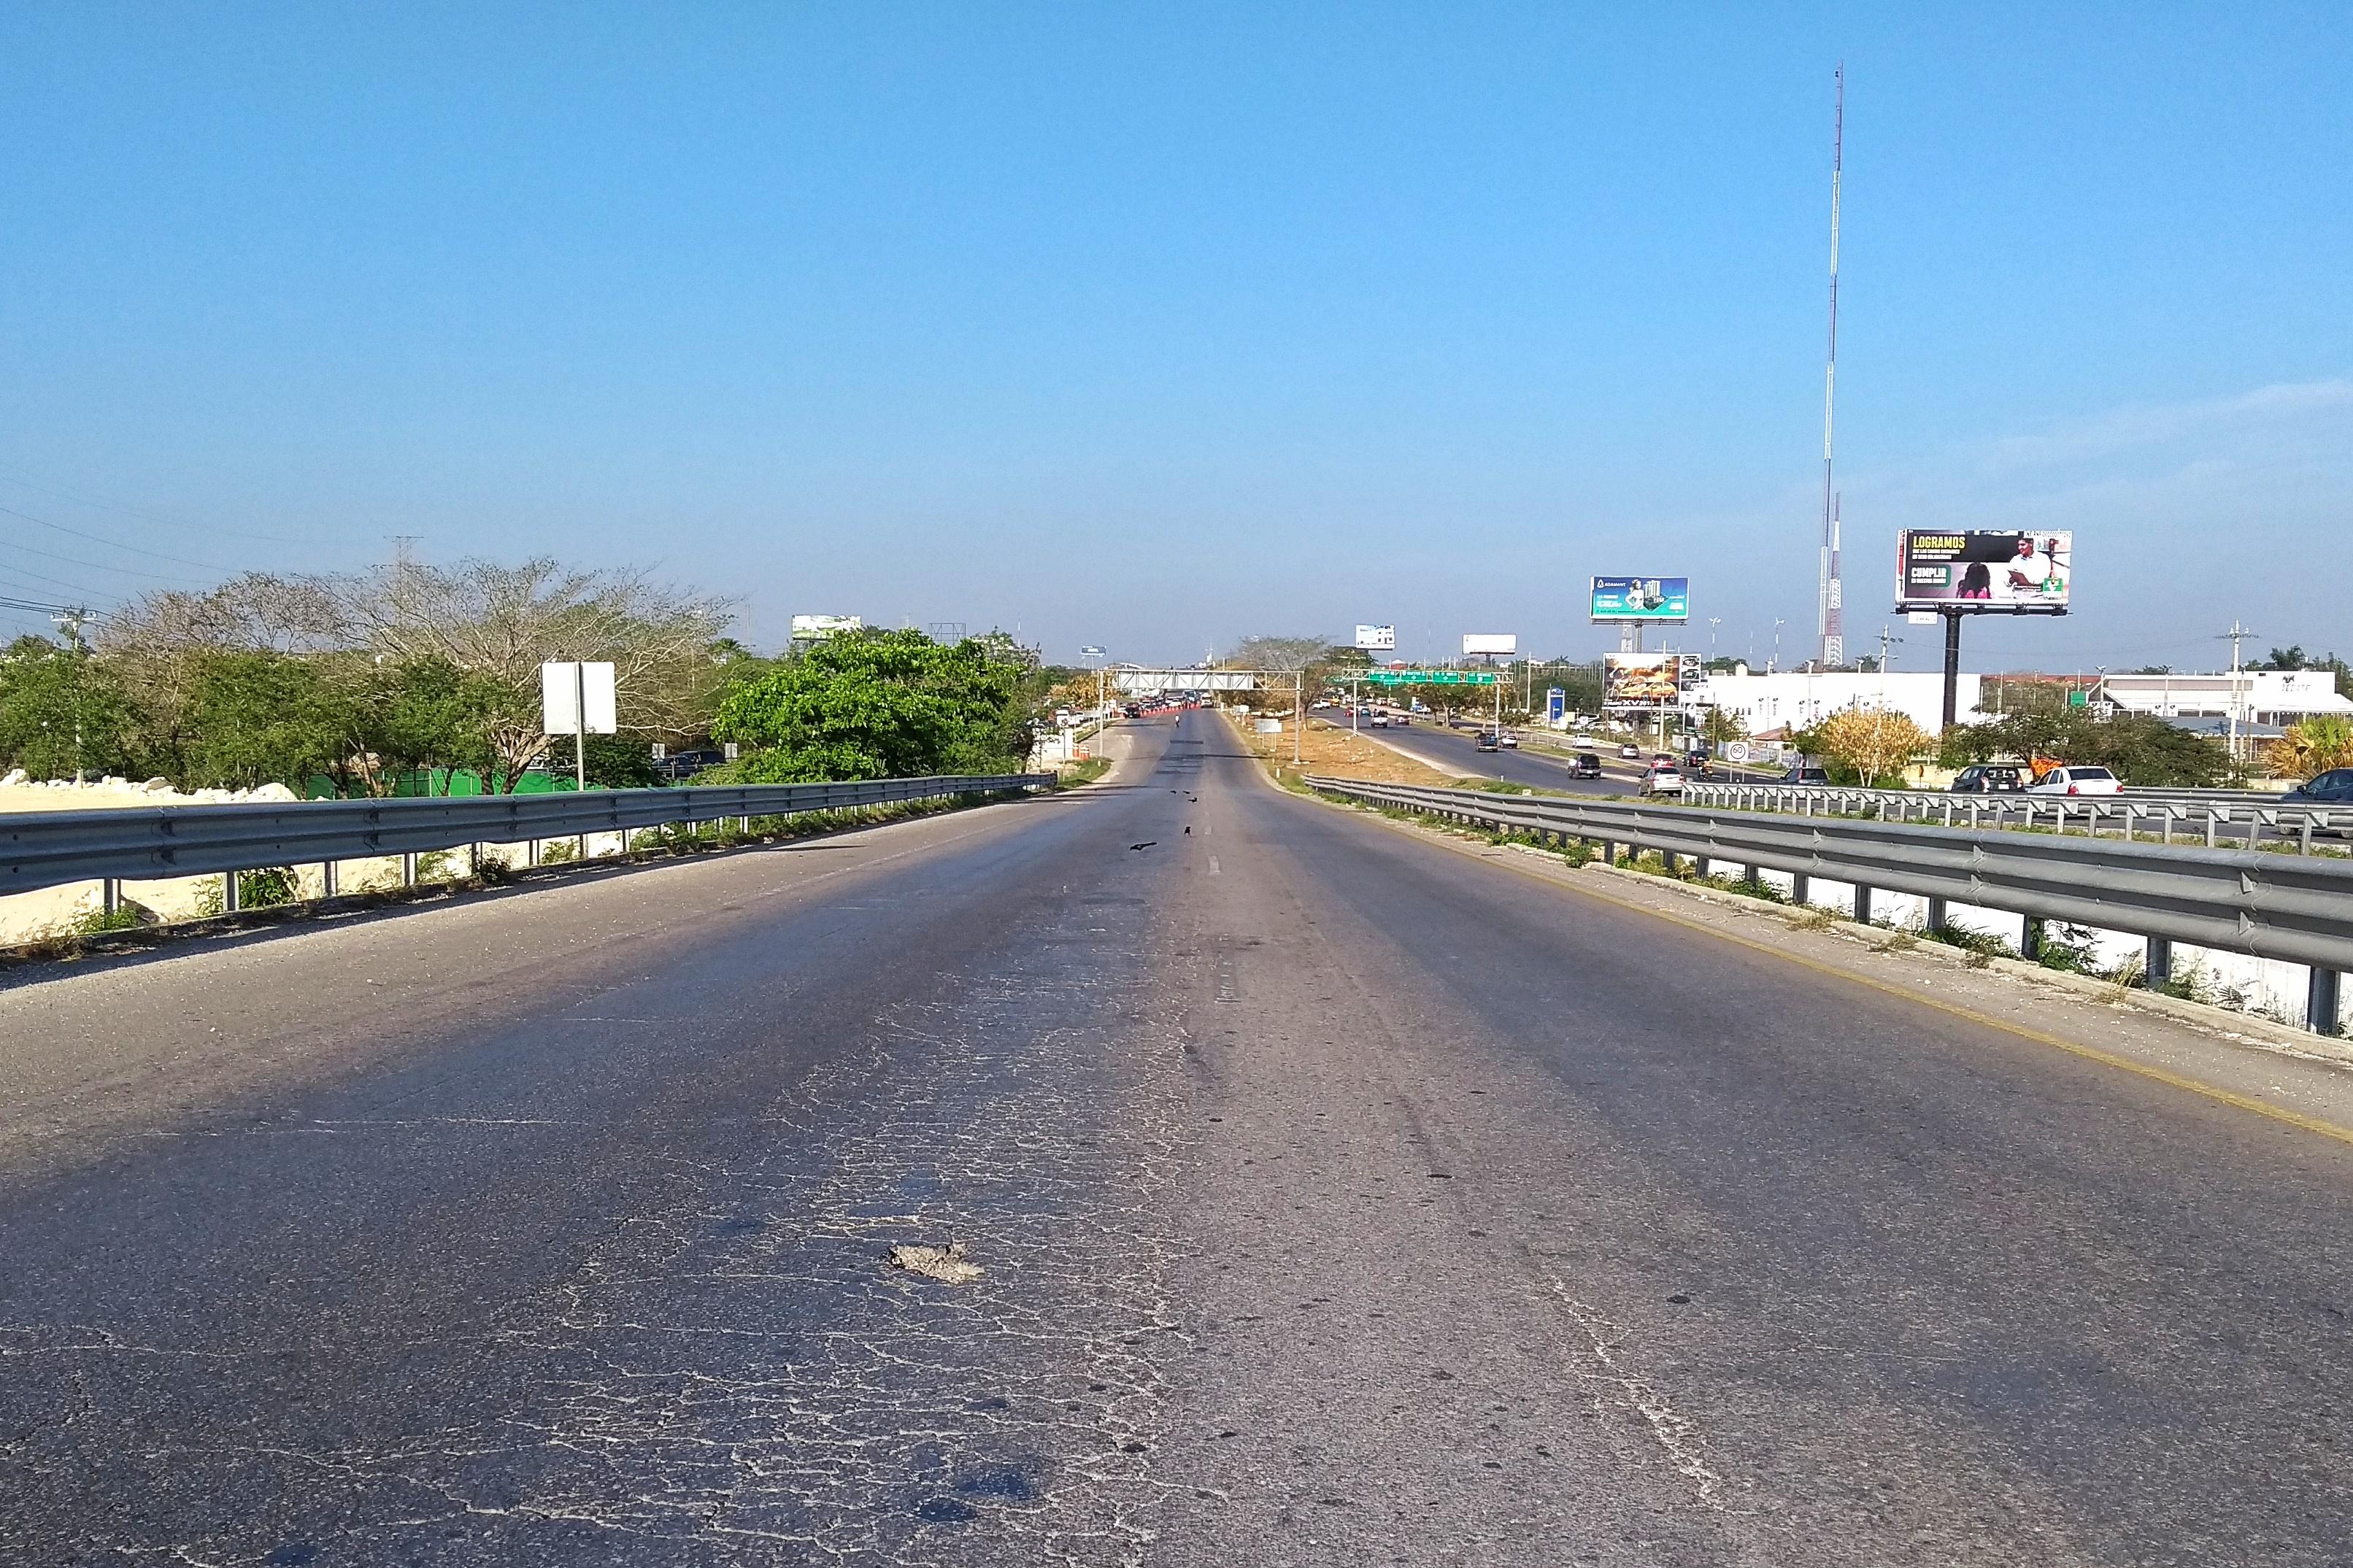 Estrangulan movilidad en Mérida; fijan 17 puntos de acceso a periférico